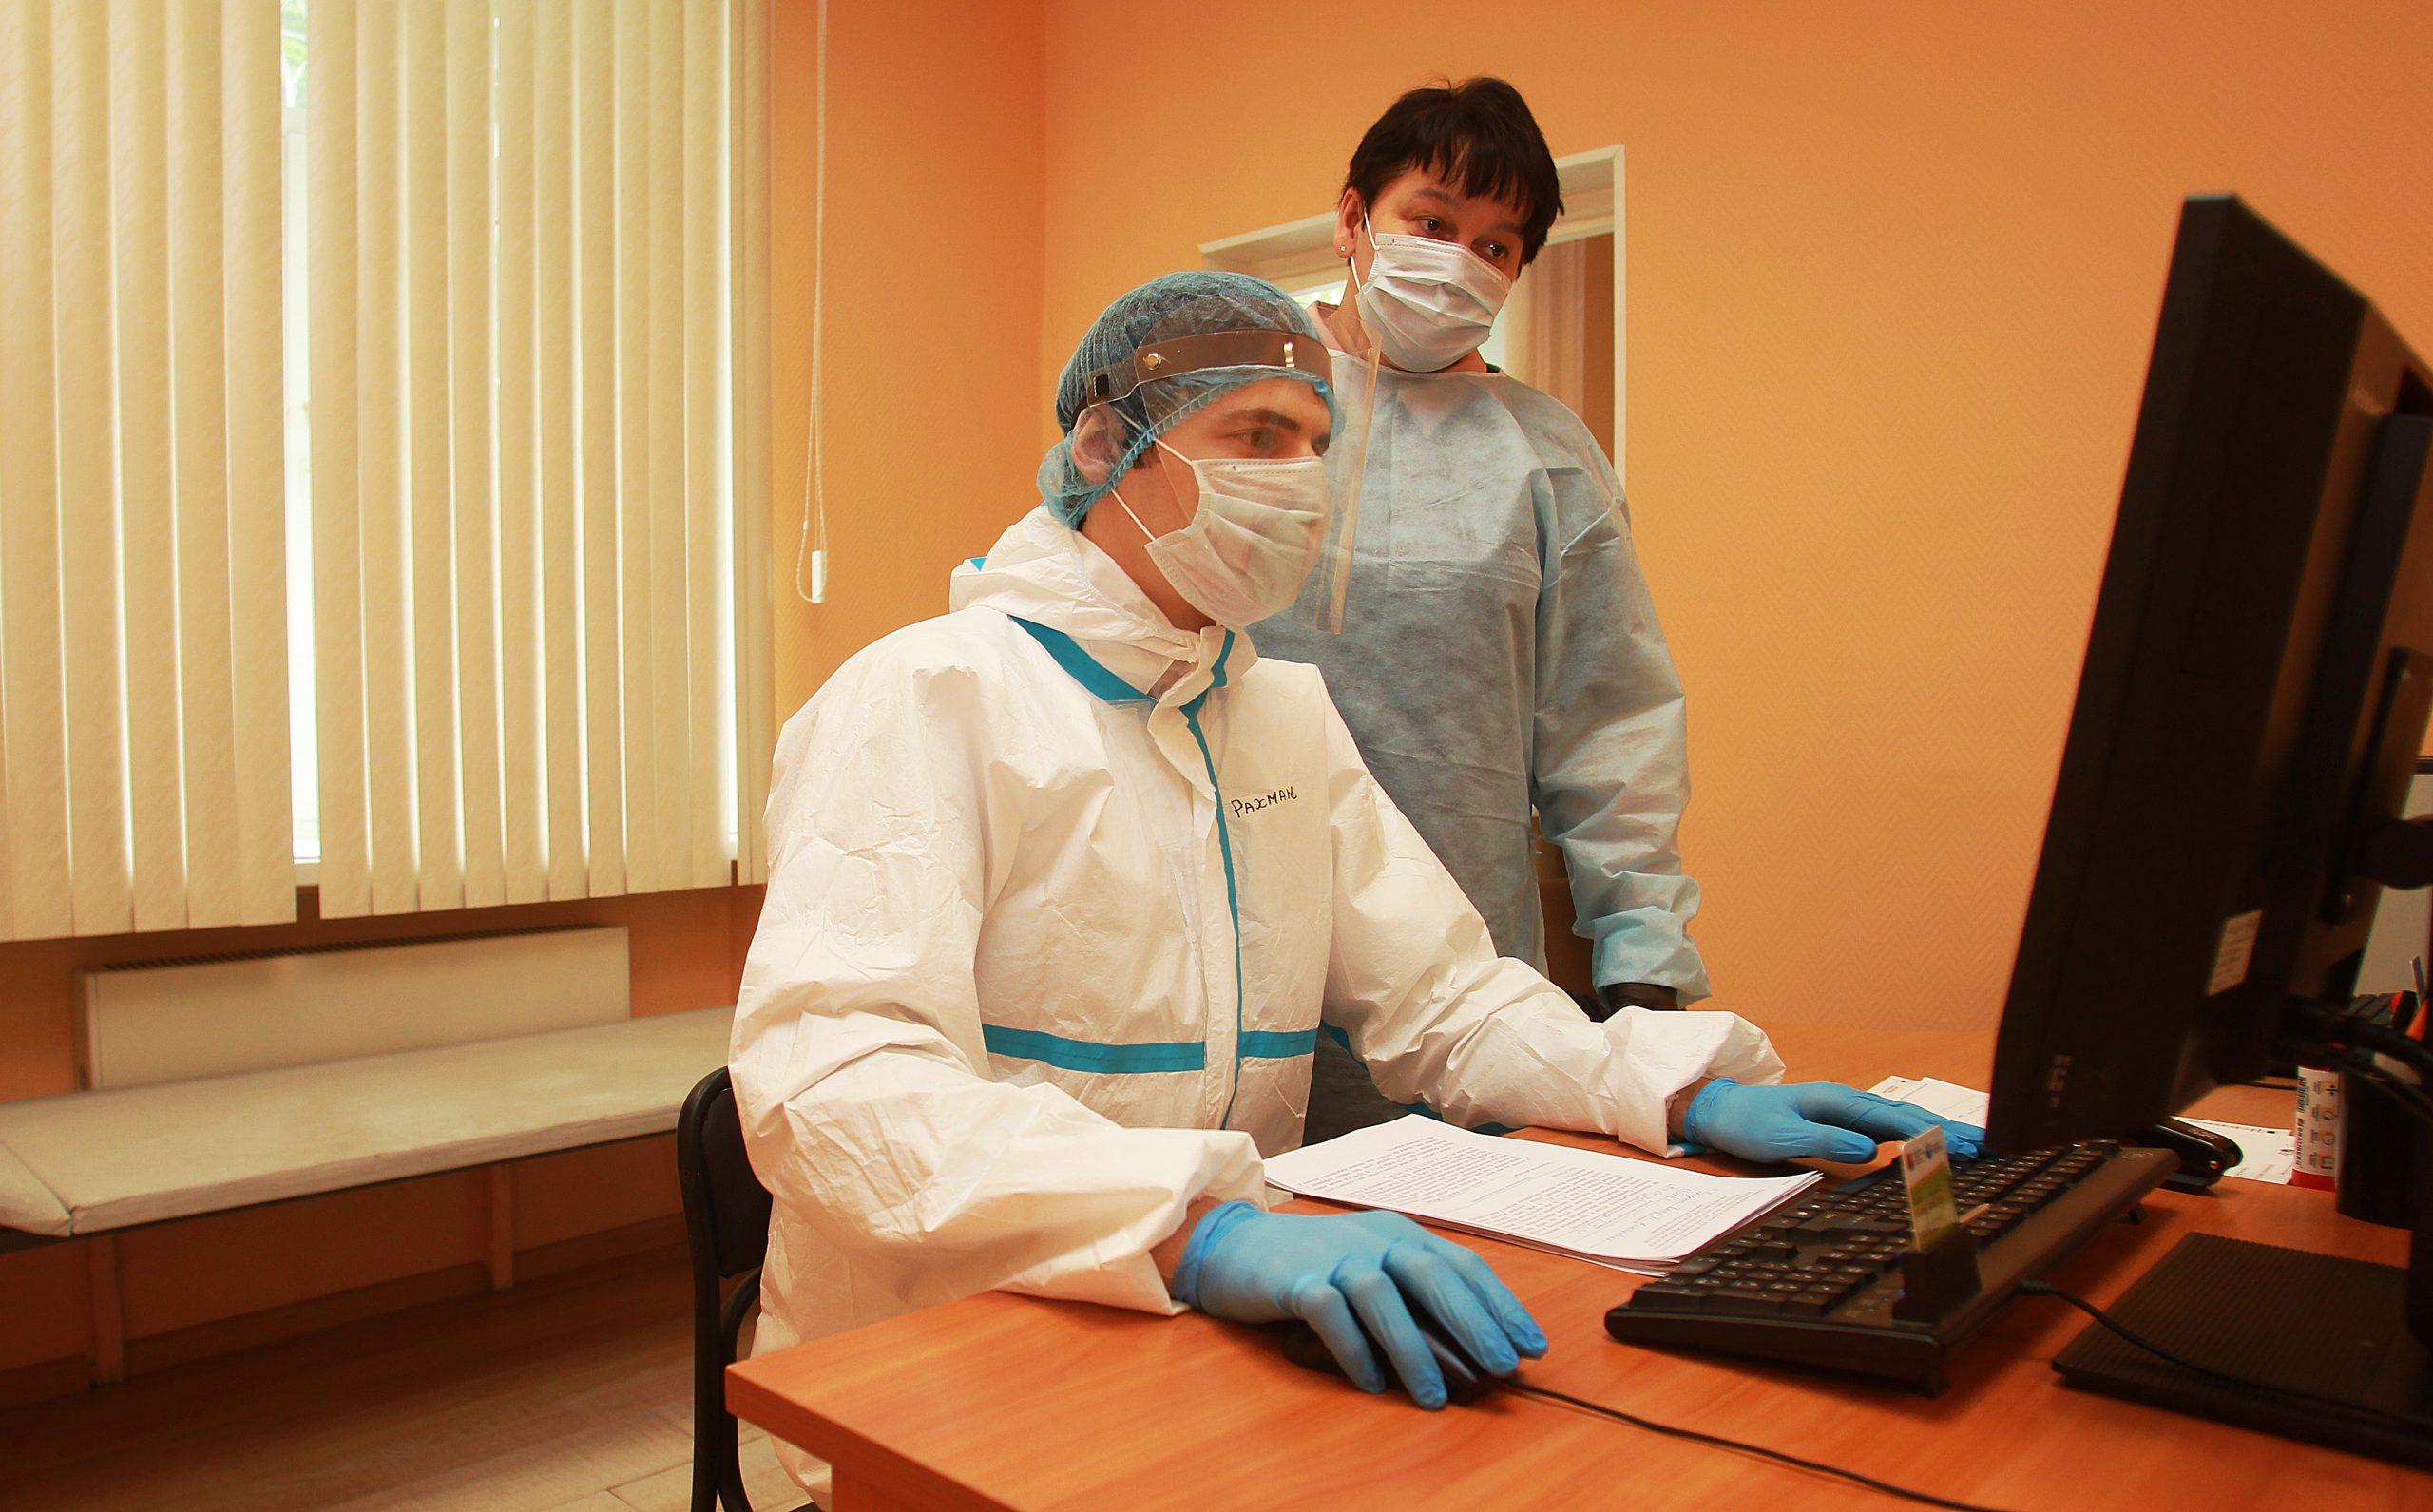 Более 22 миллионов тестов на COVID-19 провели в Москве